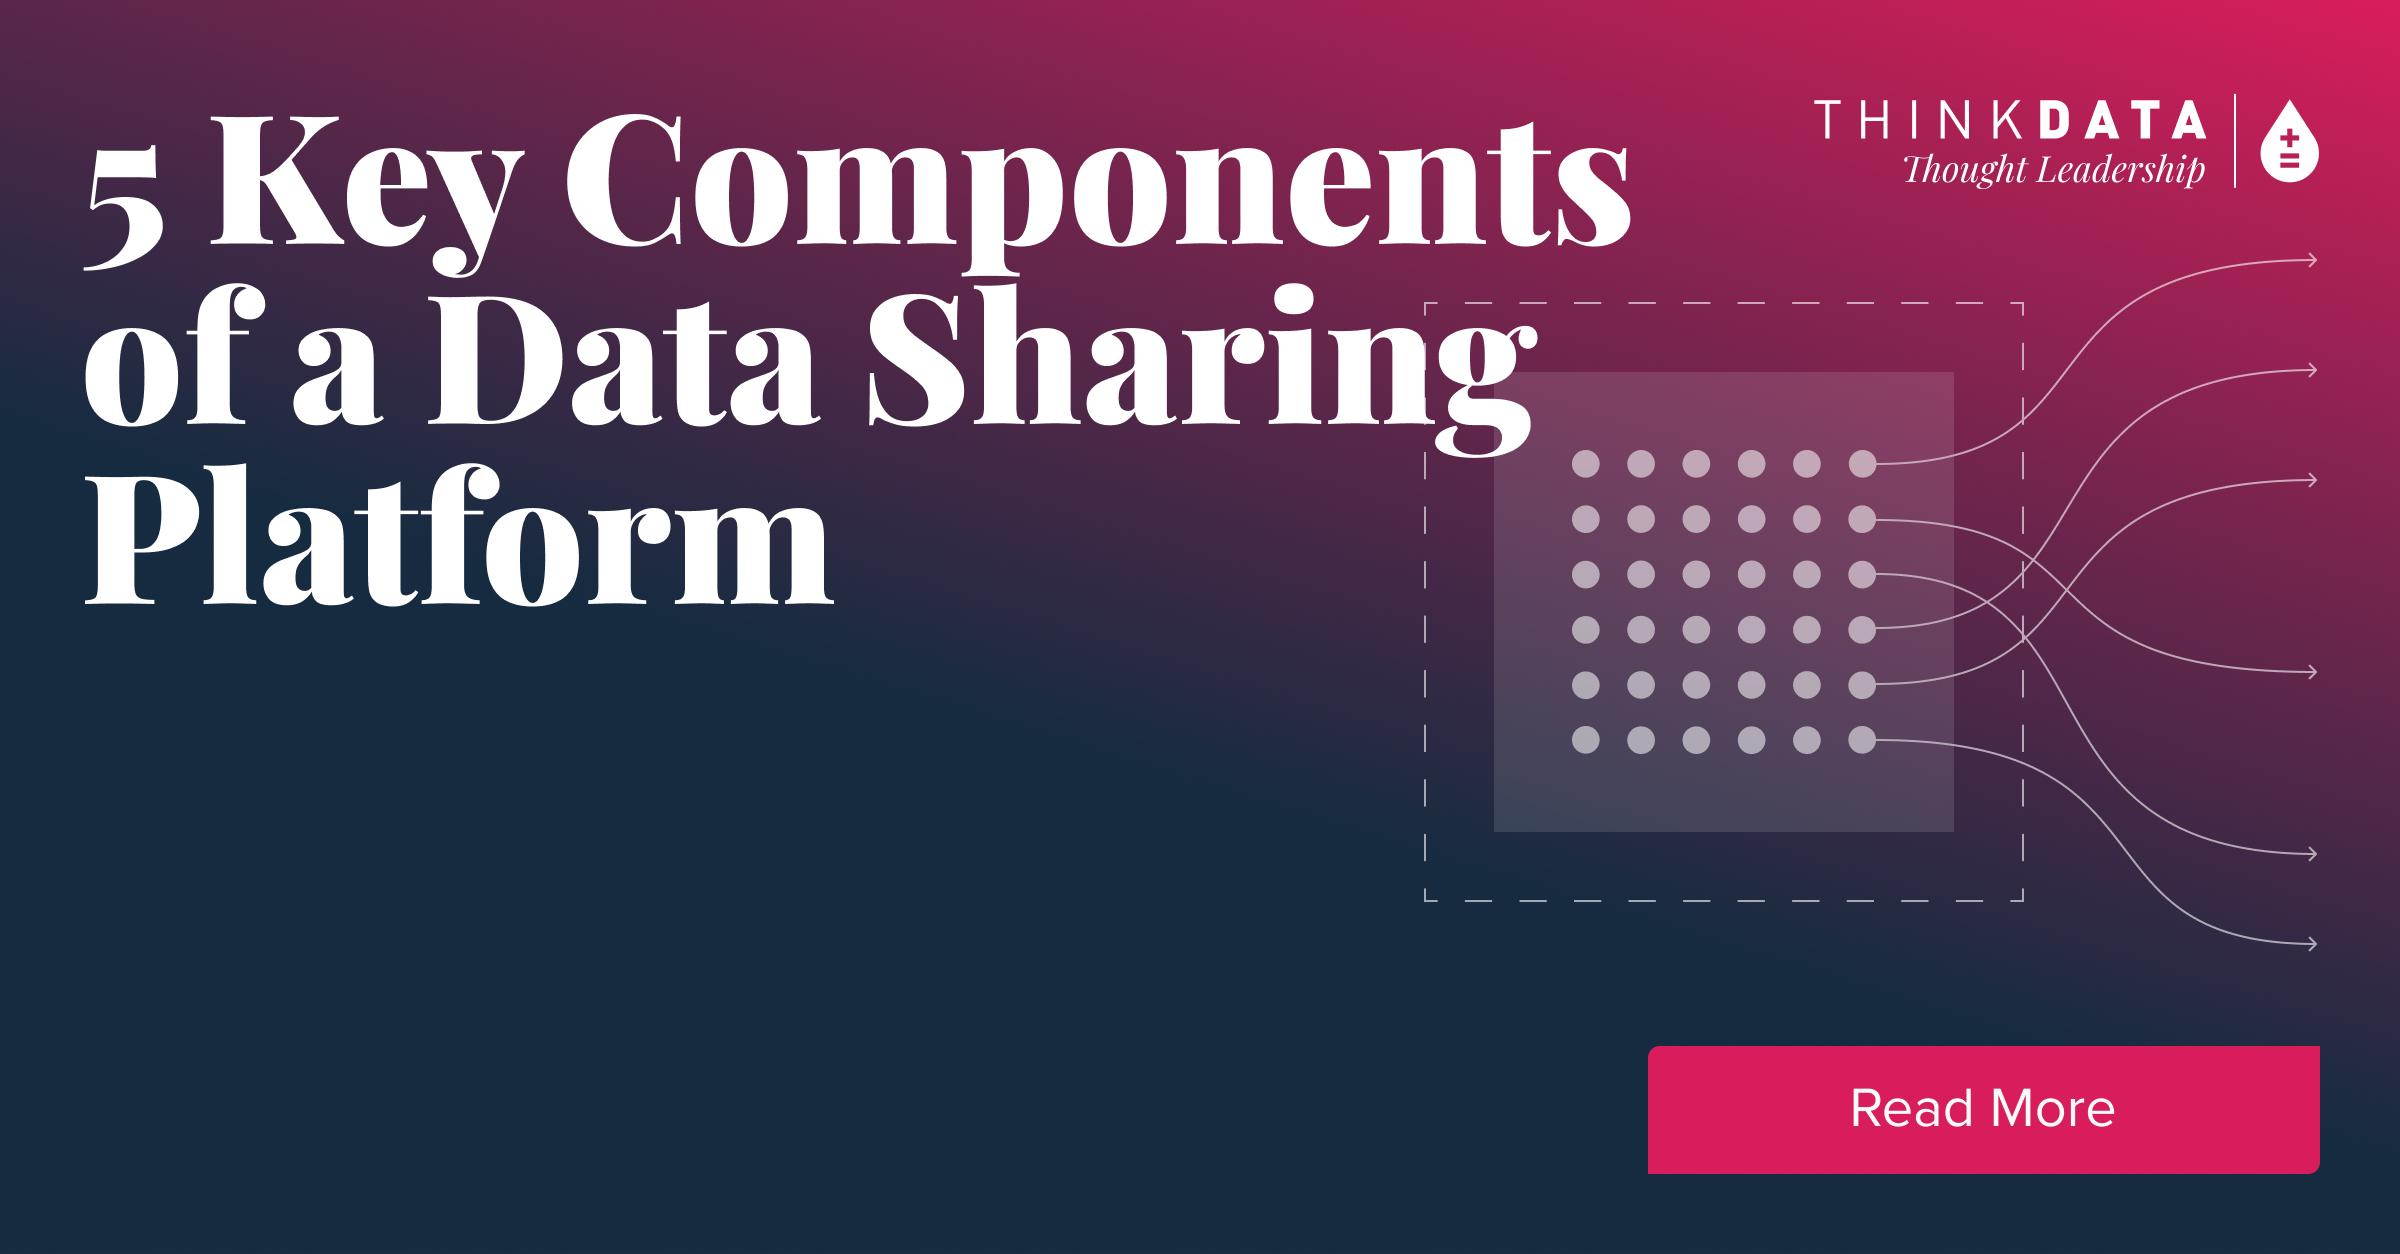 5 Key Components of a Data Sharing Platform